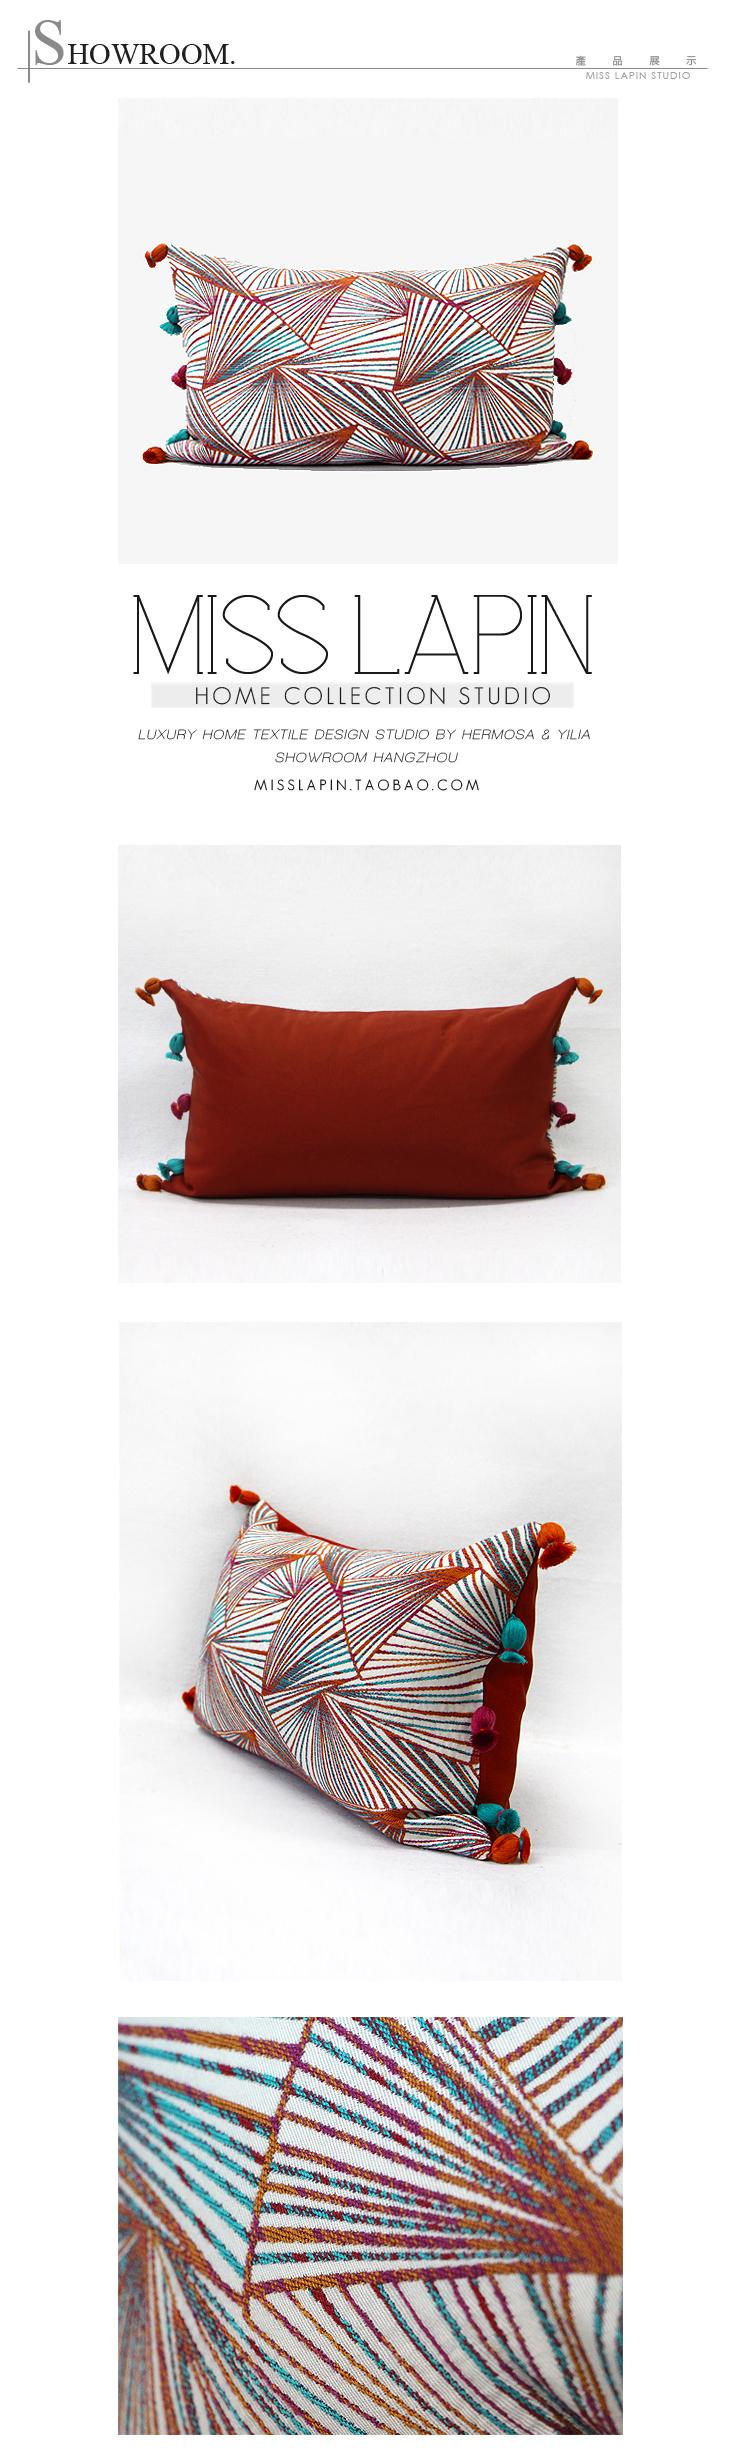 MISS LAPIN东南亚/沙发床头高档抱枕设计师/变幻几何图案流苏腰枕-淘宝网